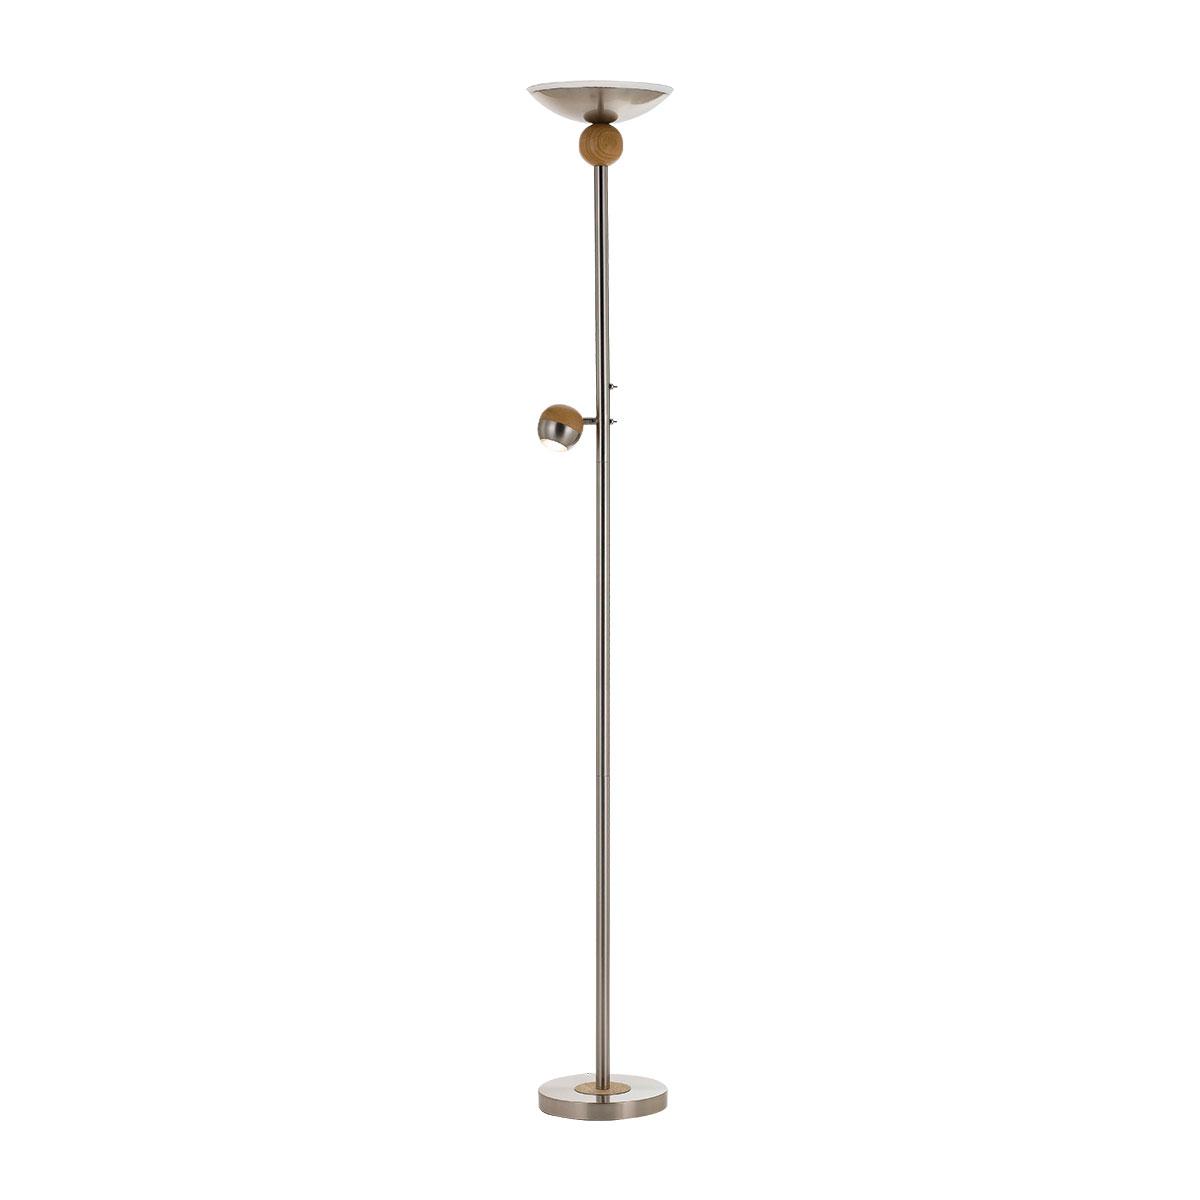 buy online d14cf 3437a Kuran 8 Watt Mother & Son LED Floor Lamp Nickel & Oak / Cool White - K